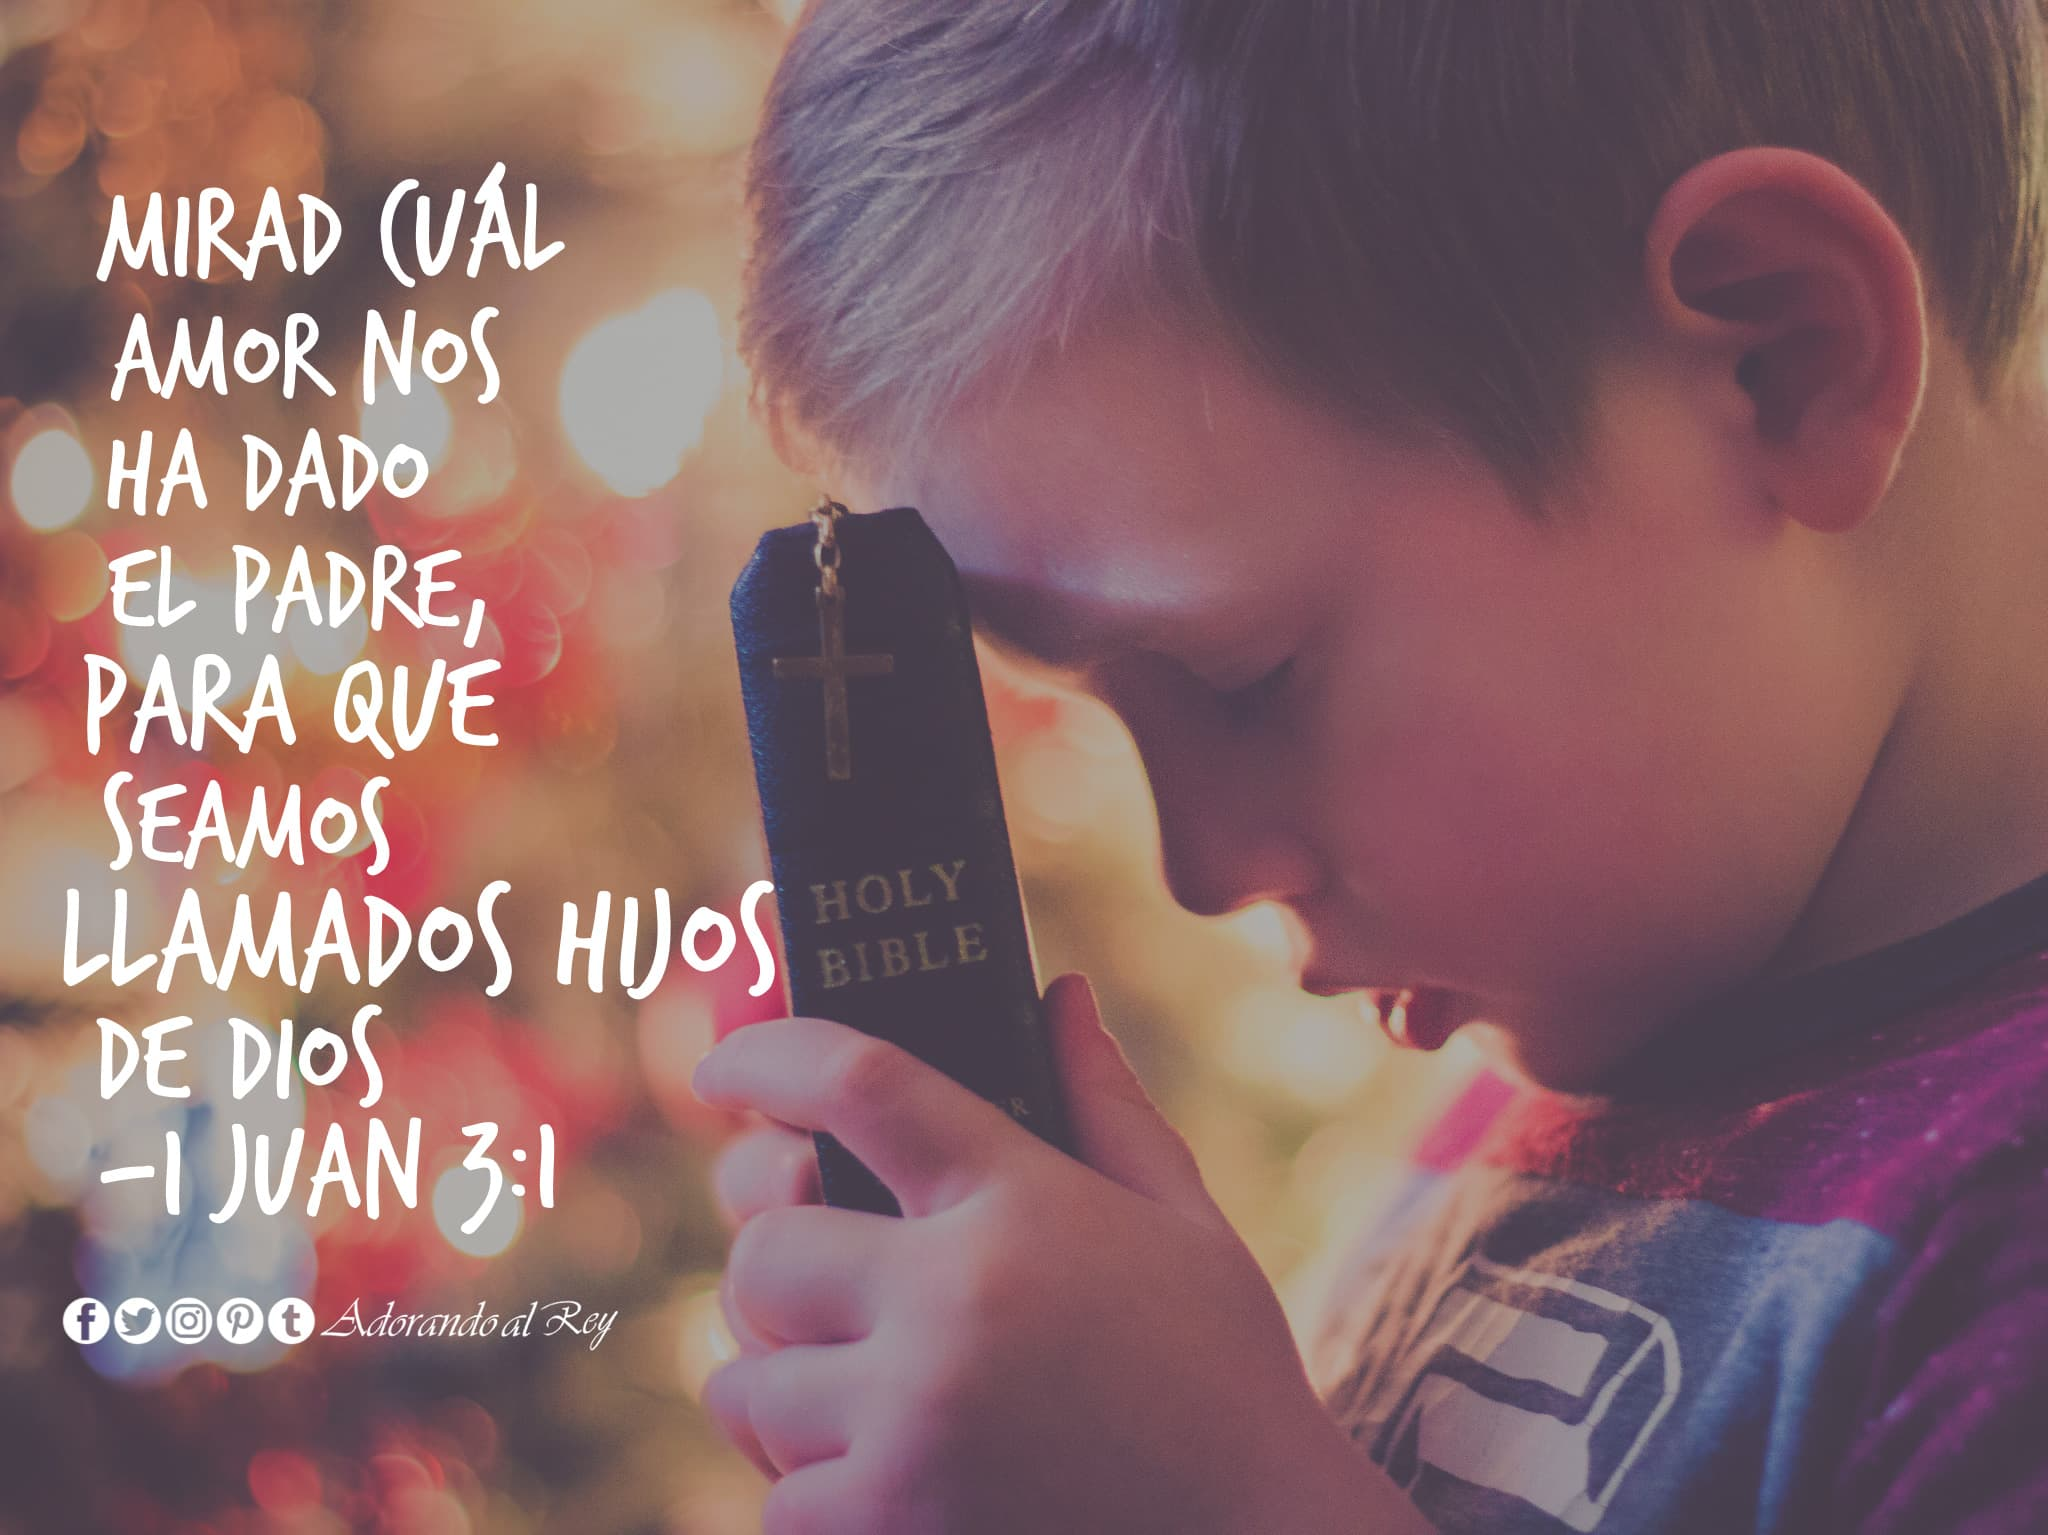 1 Juan 3:1